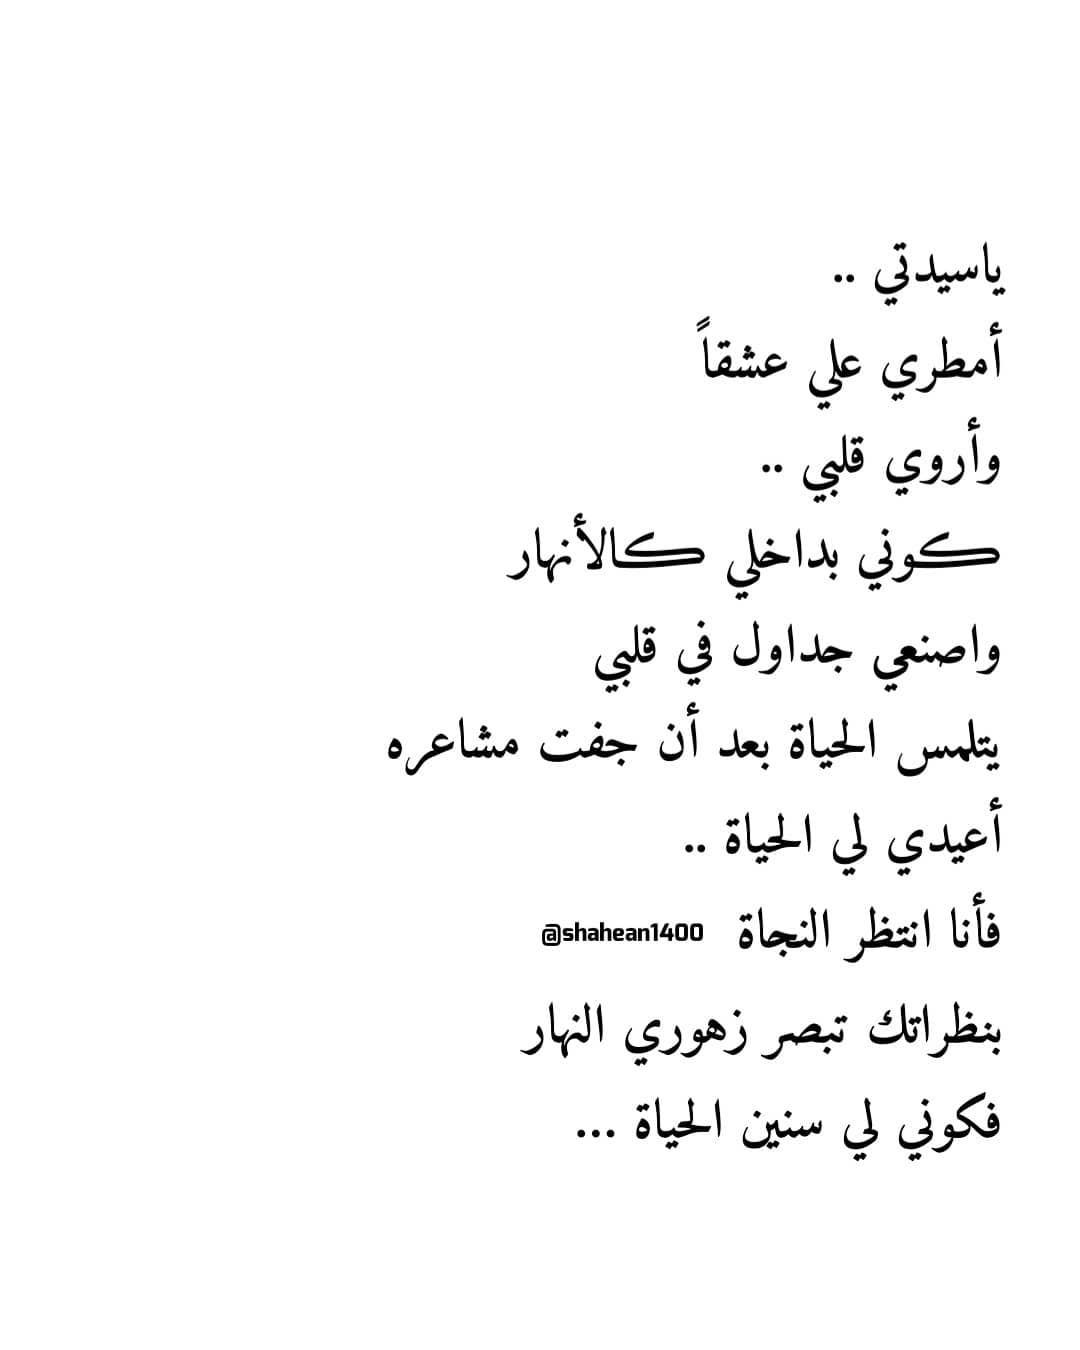 غزل اشتياق حب لهفة عشق حنين احساس همسات اقتباس خواطر خاطرة Arabic Quotes Quotes App